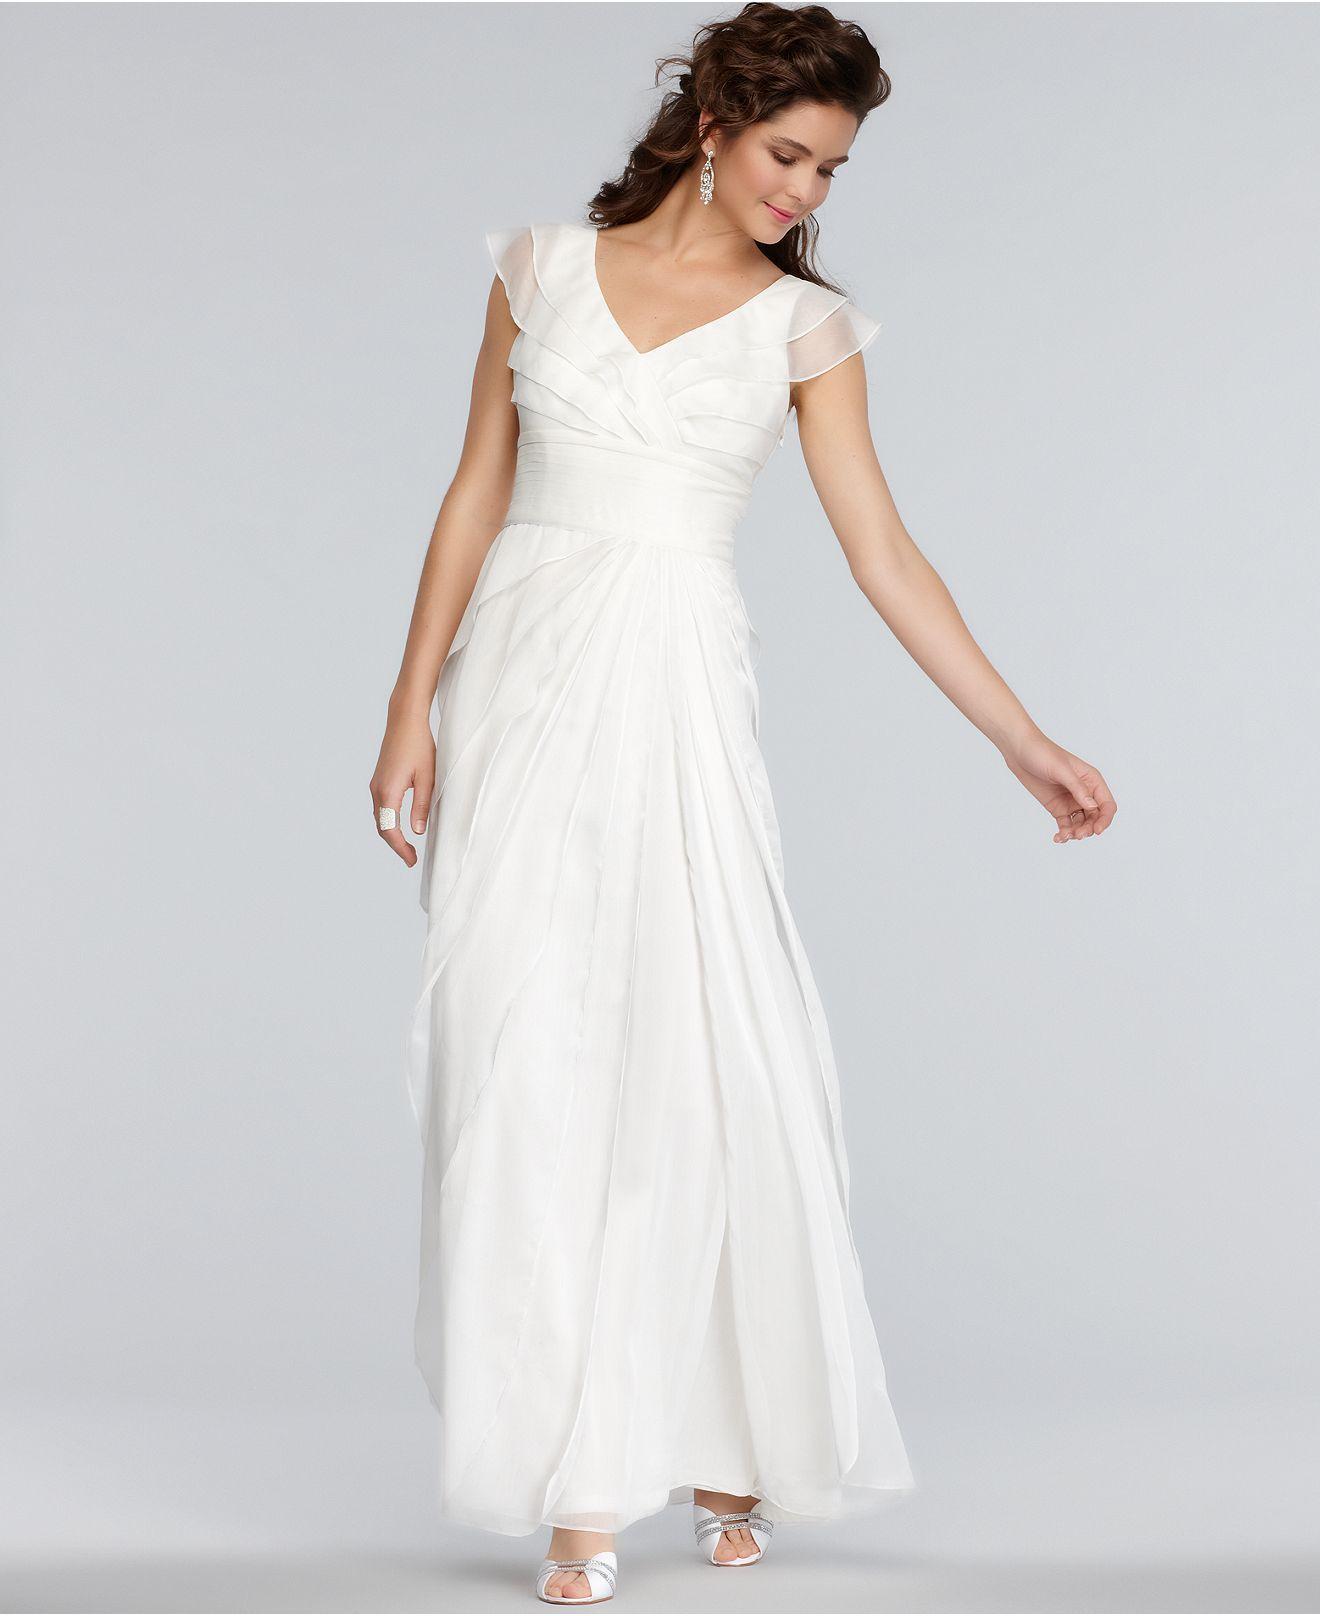 macy's wedding dresses Adrianna Papell Dress Cap Sleeve Pleated Empire Waist Tiered Gown Shop all Wedding Dresses Women Macy s